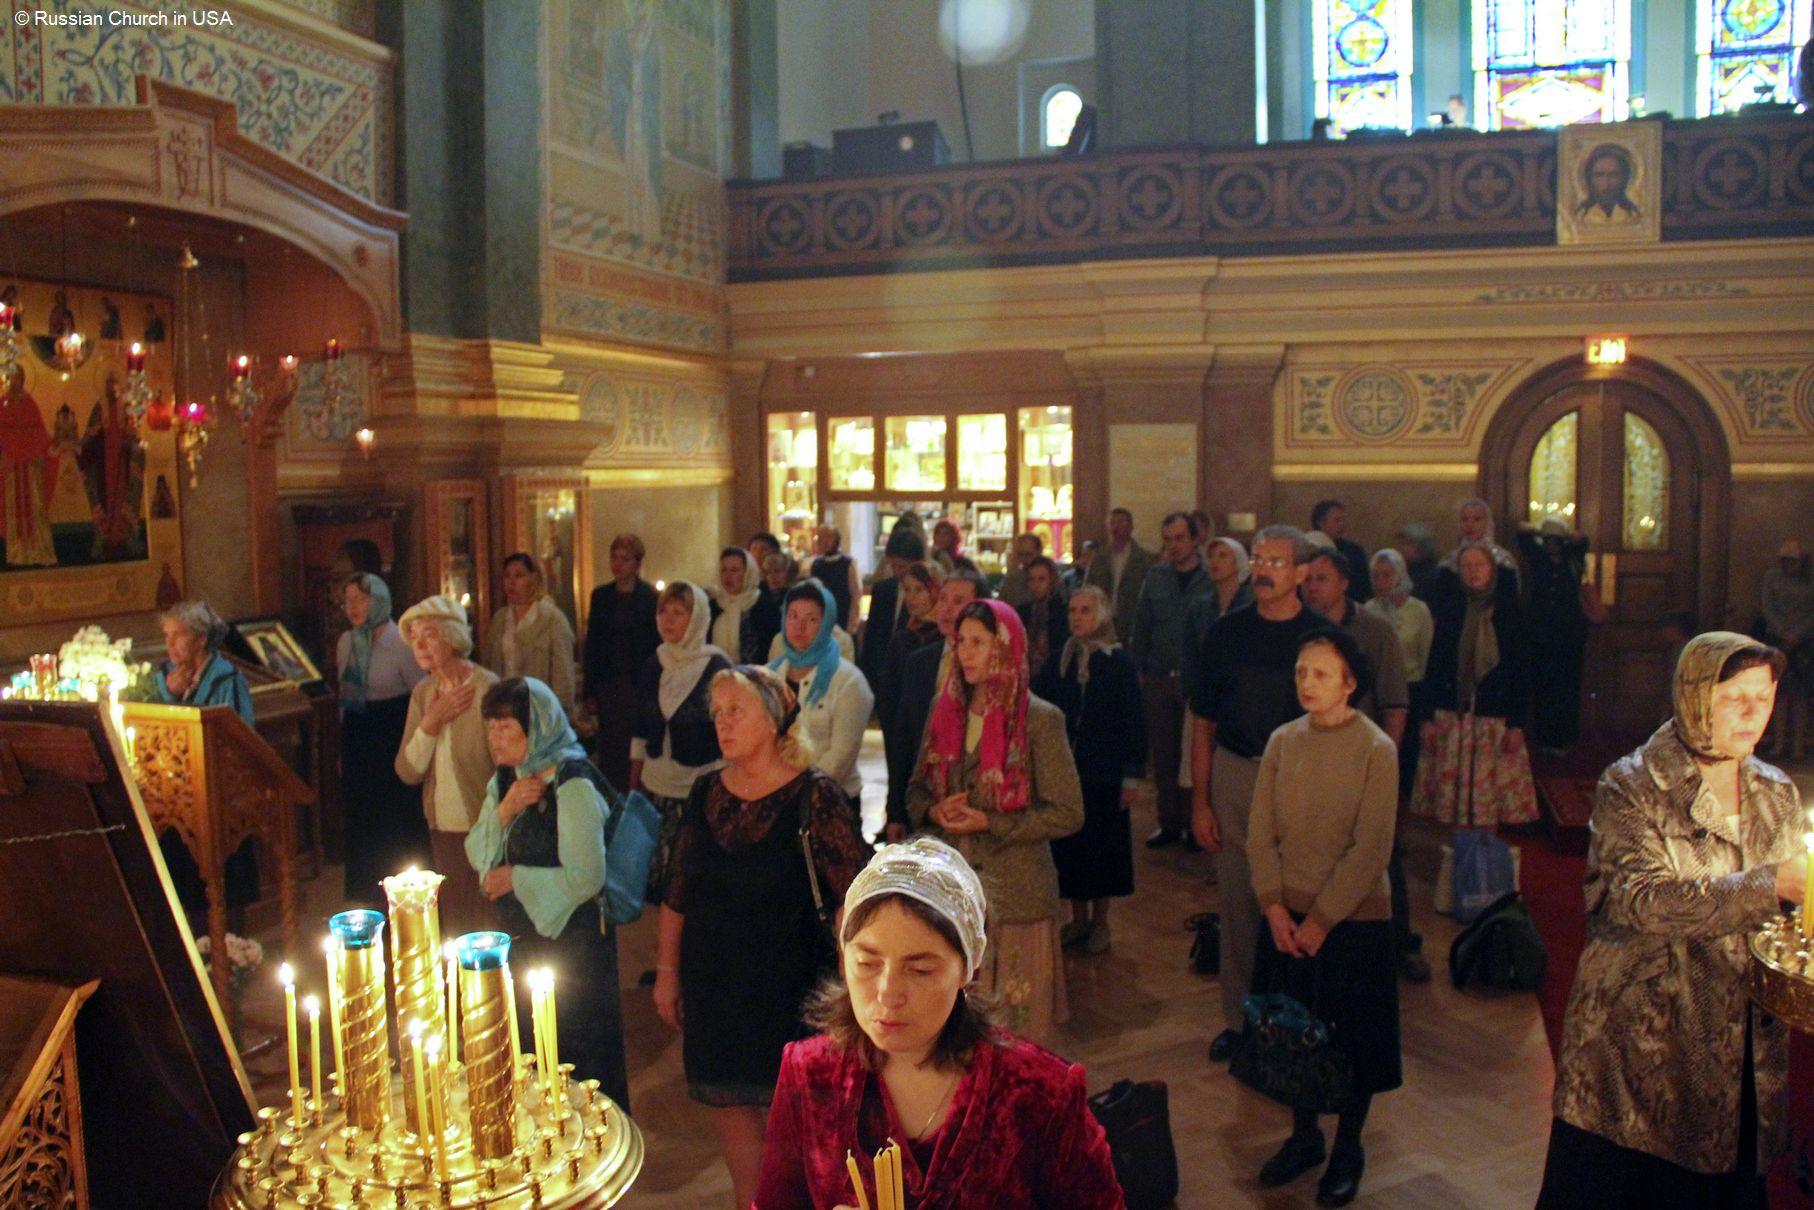 Аудио православие в америке: взгляд изнутри православие и ми.